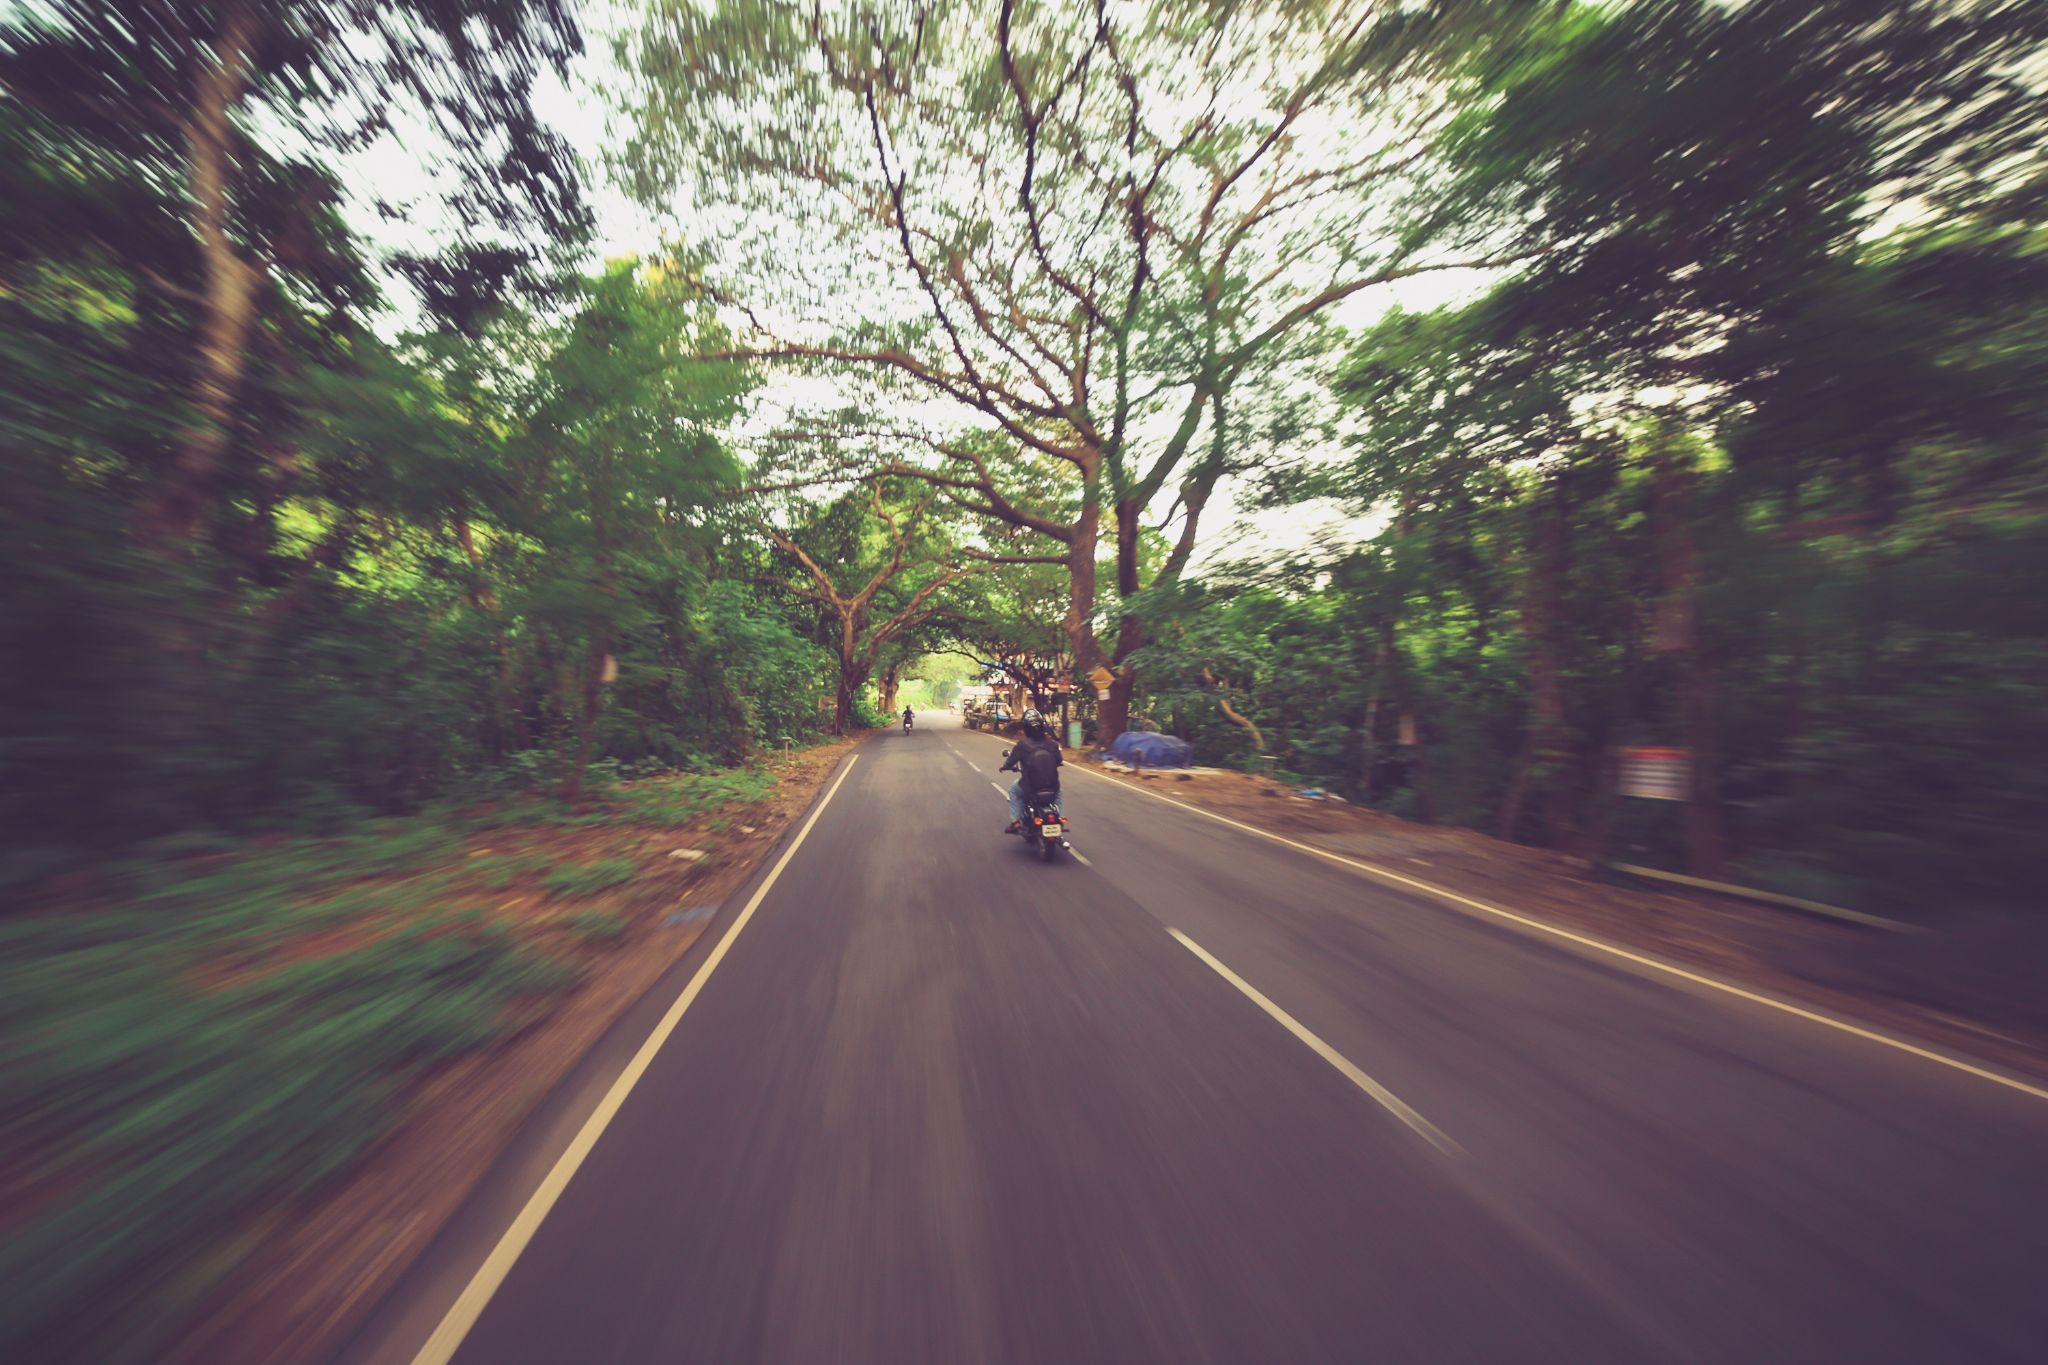 Cruising beneath the green lush by Jackson James